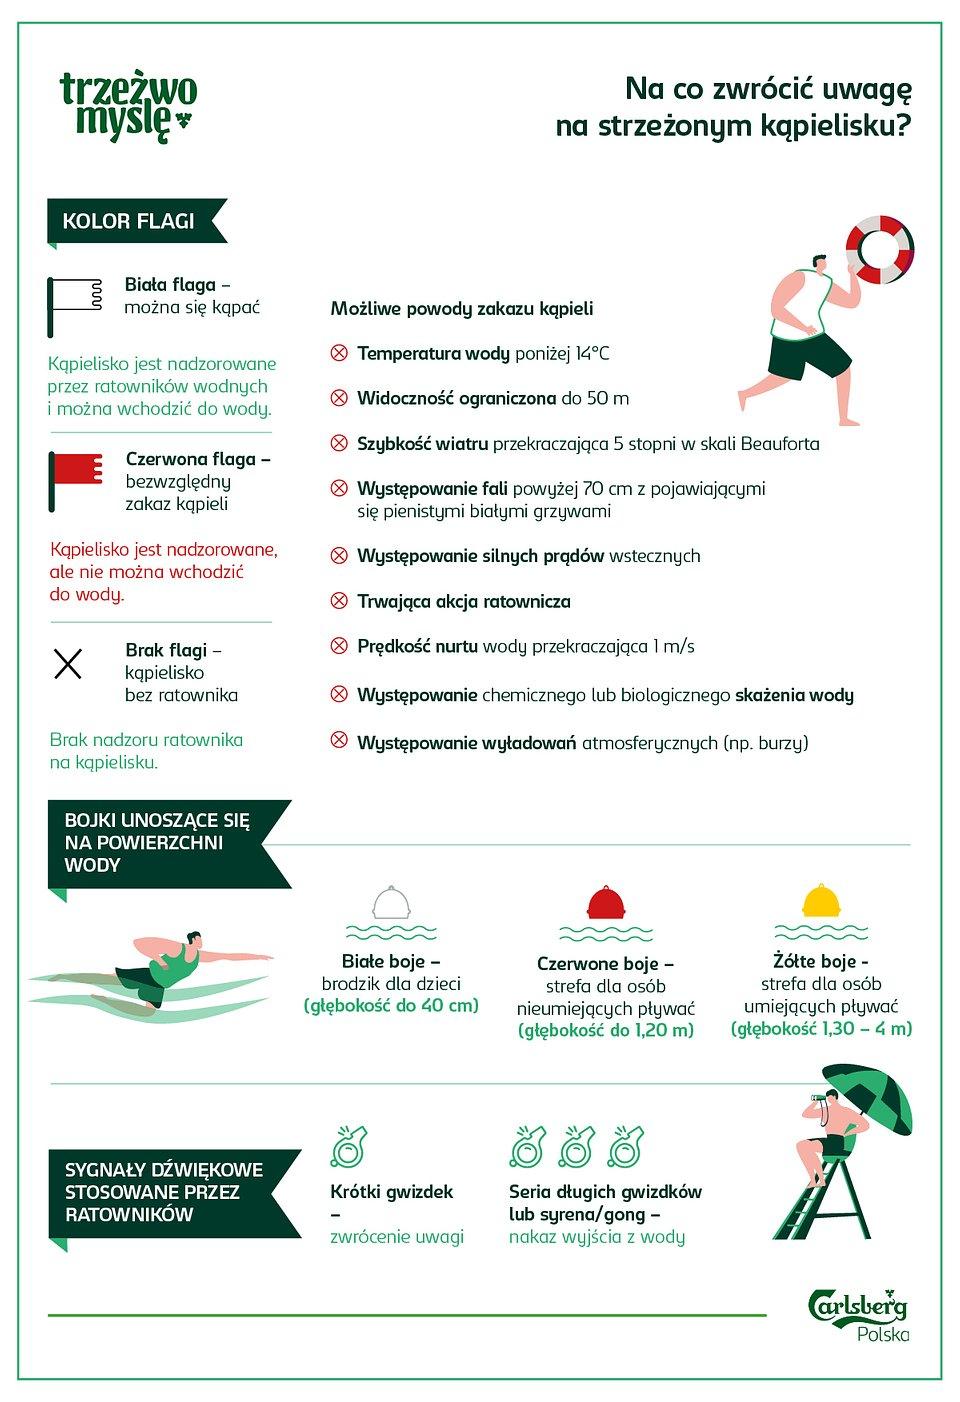 Carlsberg_infografika_II_29_06.jpg